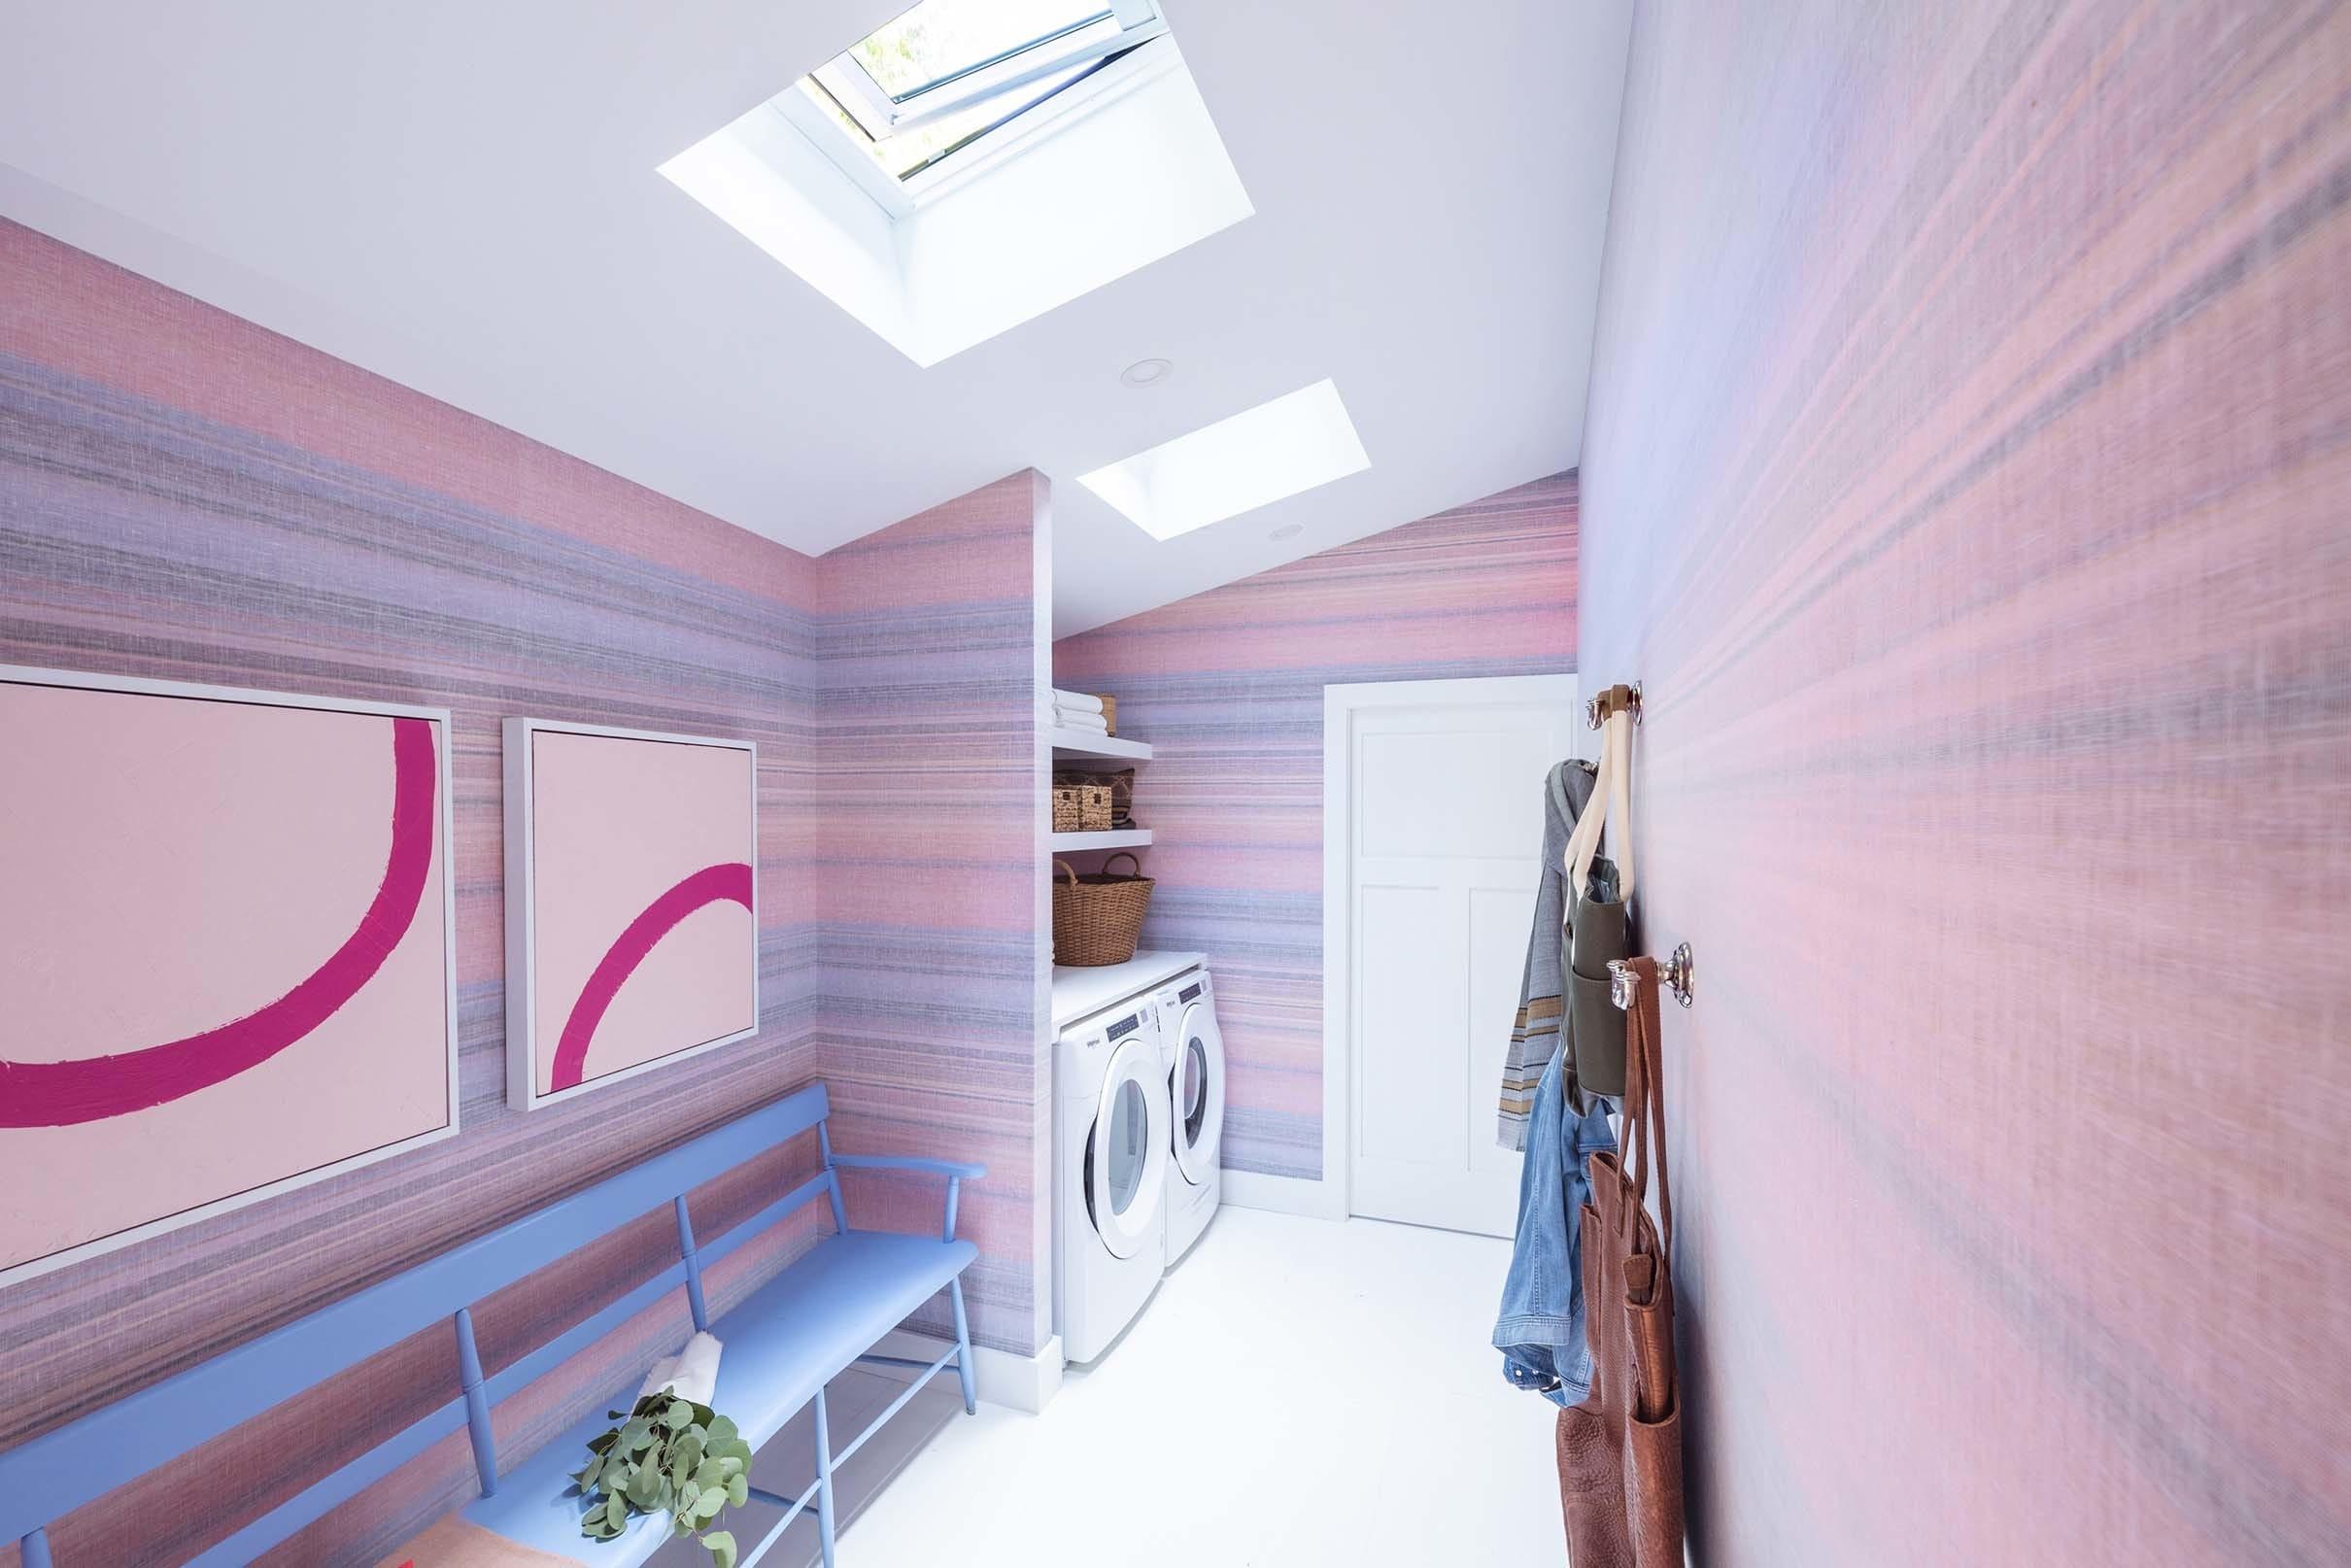 Laundry room skylights pink purple wallpaper